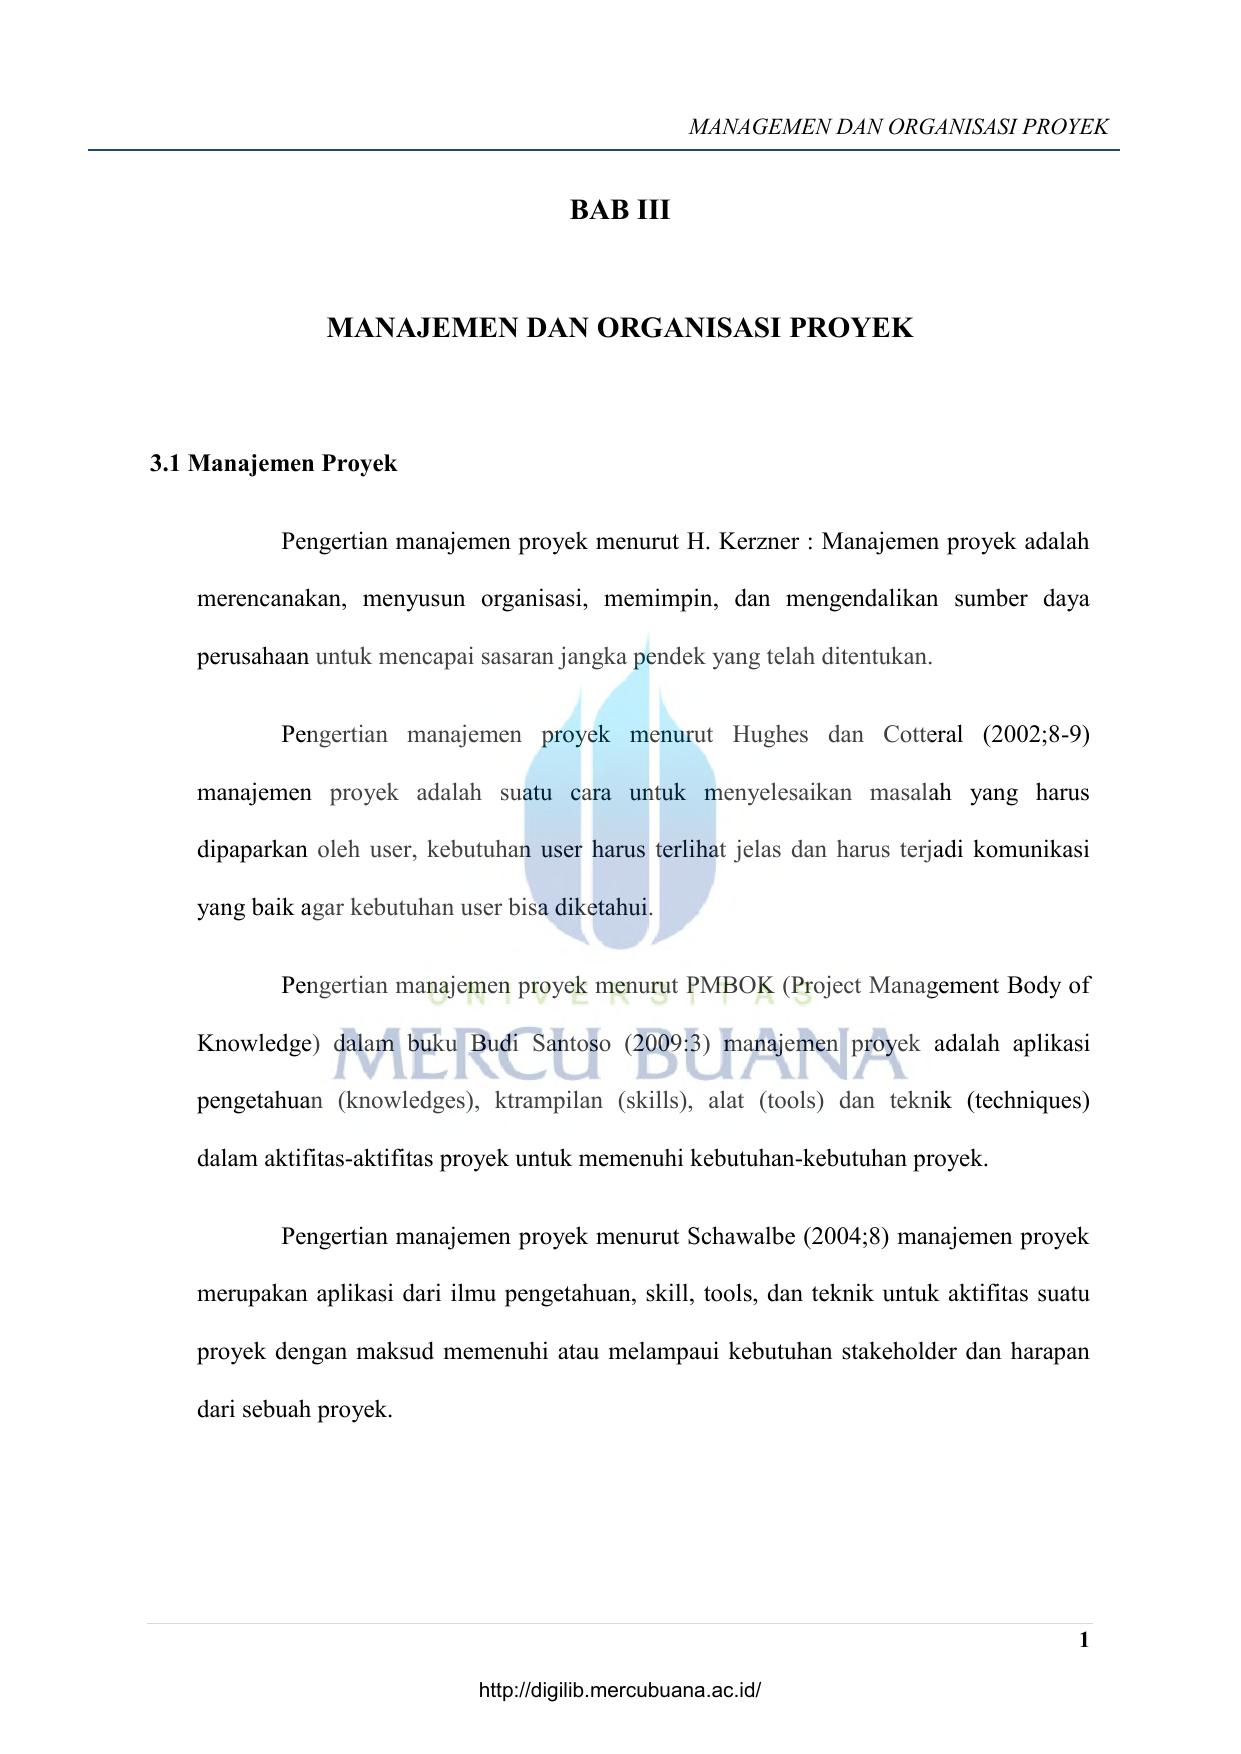 Bab Iii Manajemen Dan Organisasi Proyek